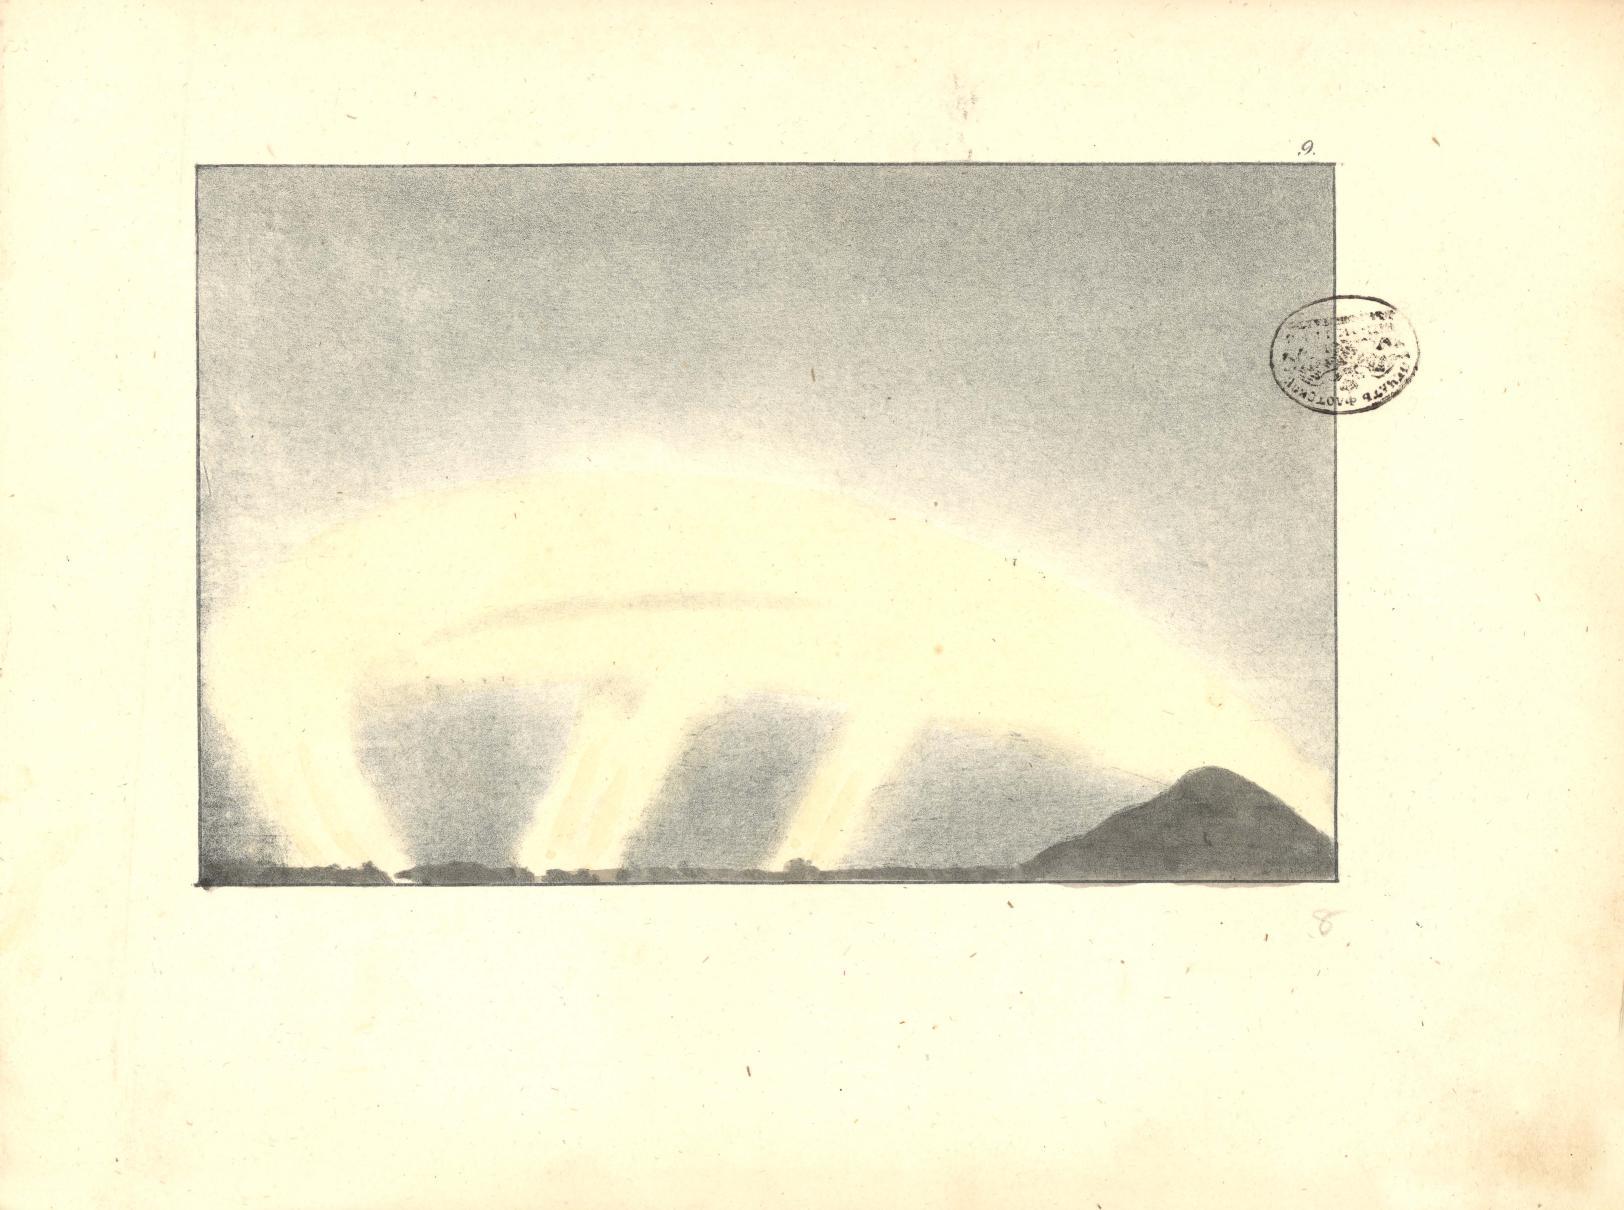 08. Северное сияние